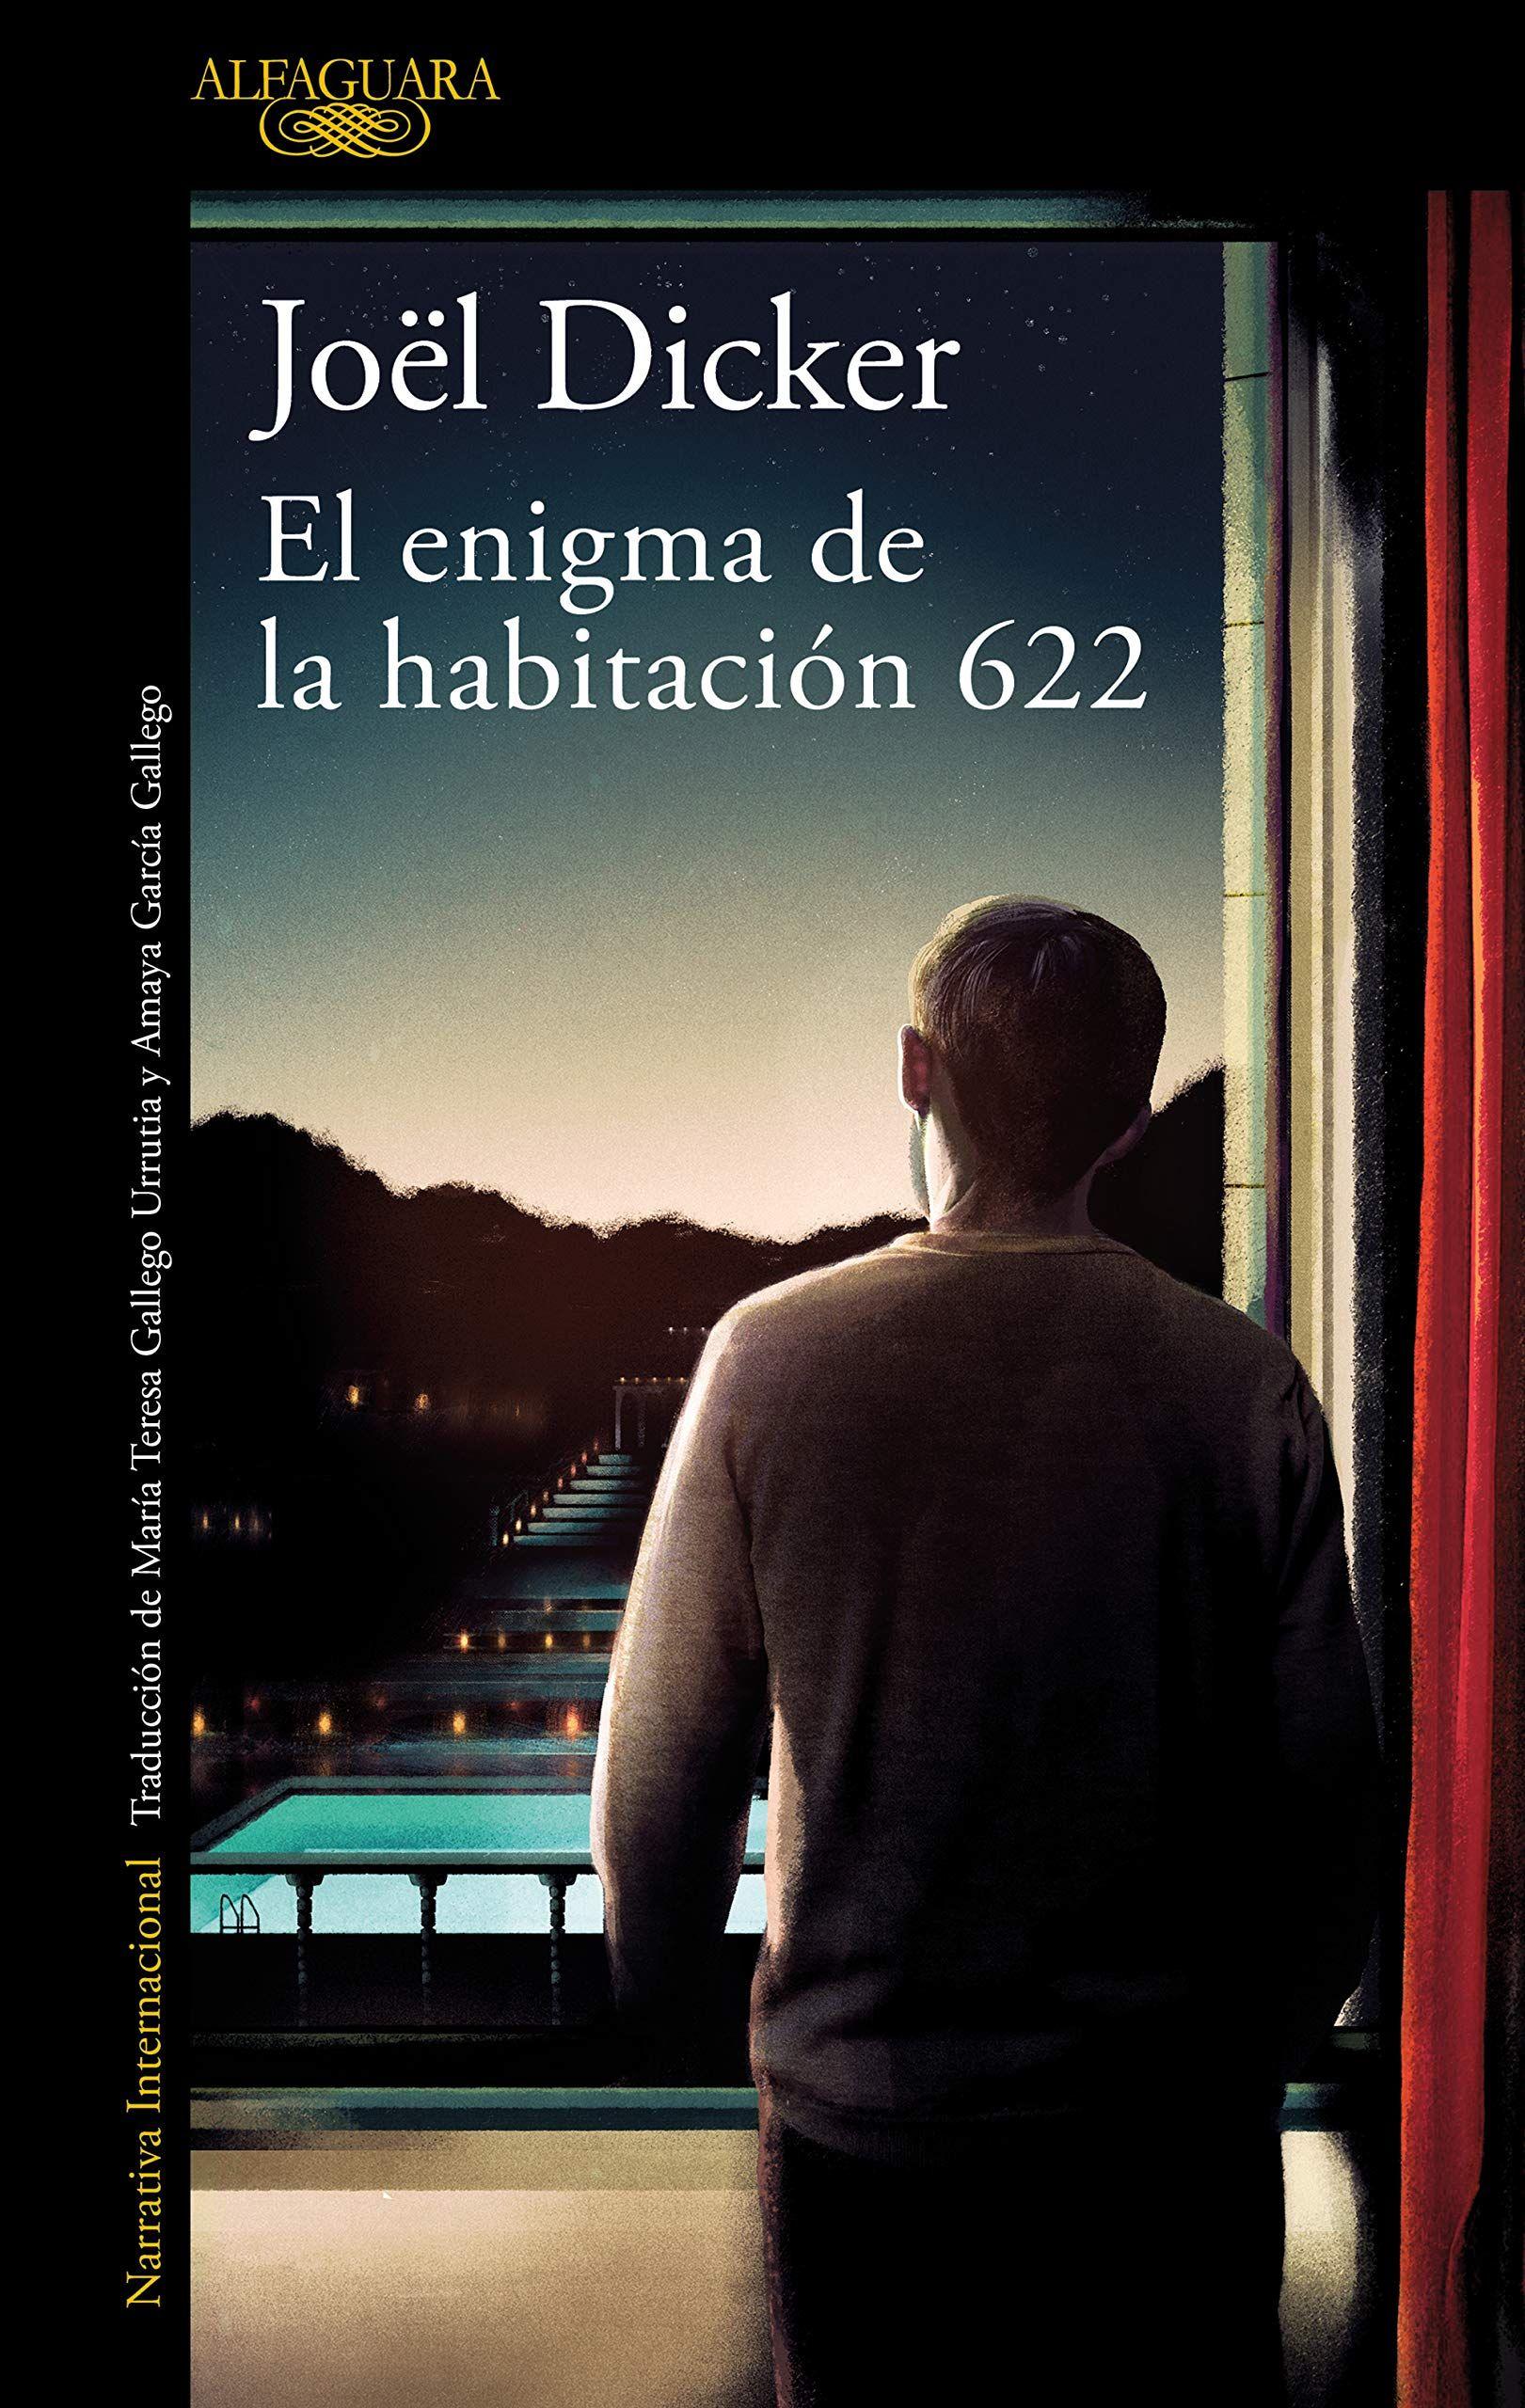 El Enigma De La Habitacion 622 By Joel Dicker In 2020 Book Recommendations Books To Read Got Books